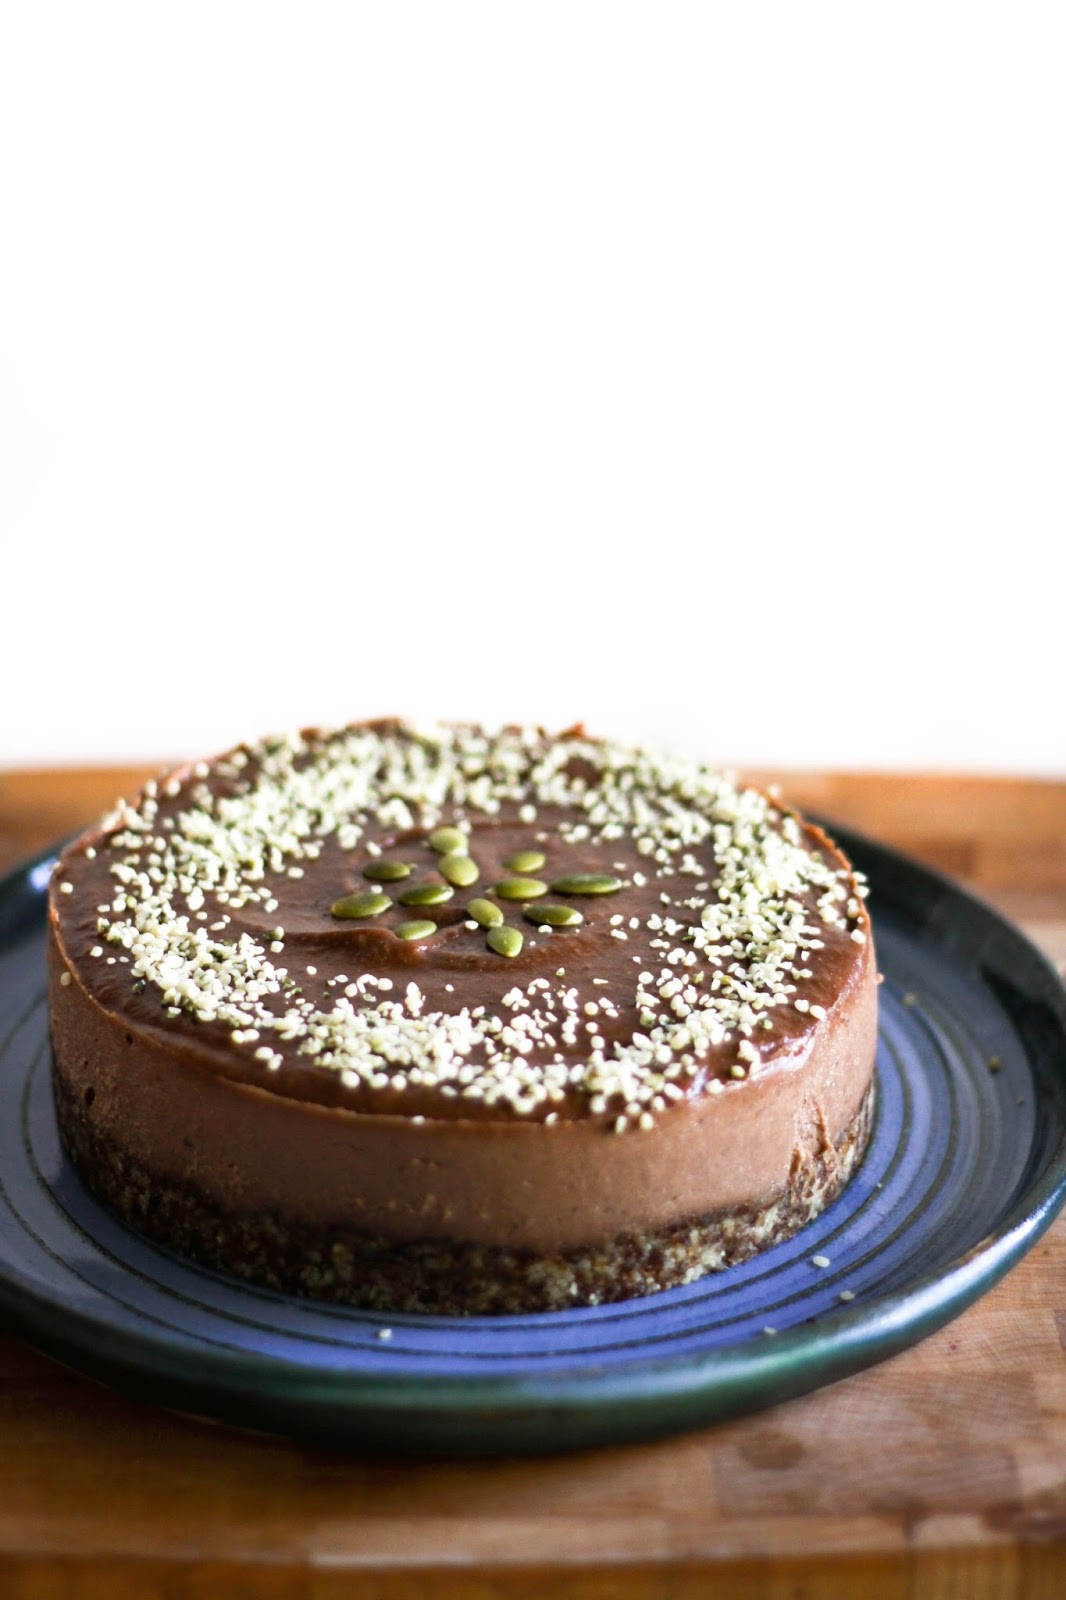 This Rawsome Vegan Life Raw Vegan Chocolate Cake